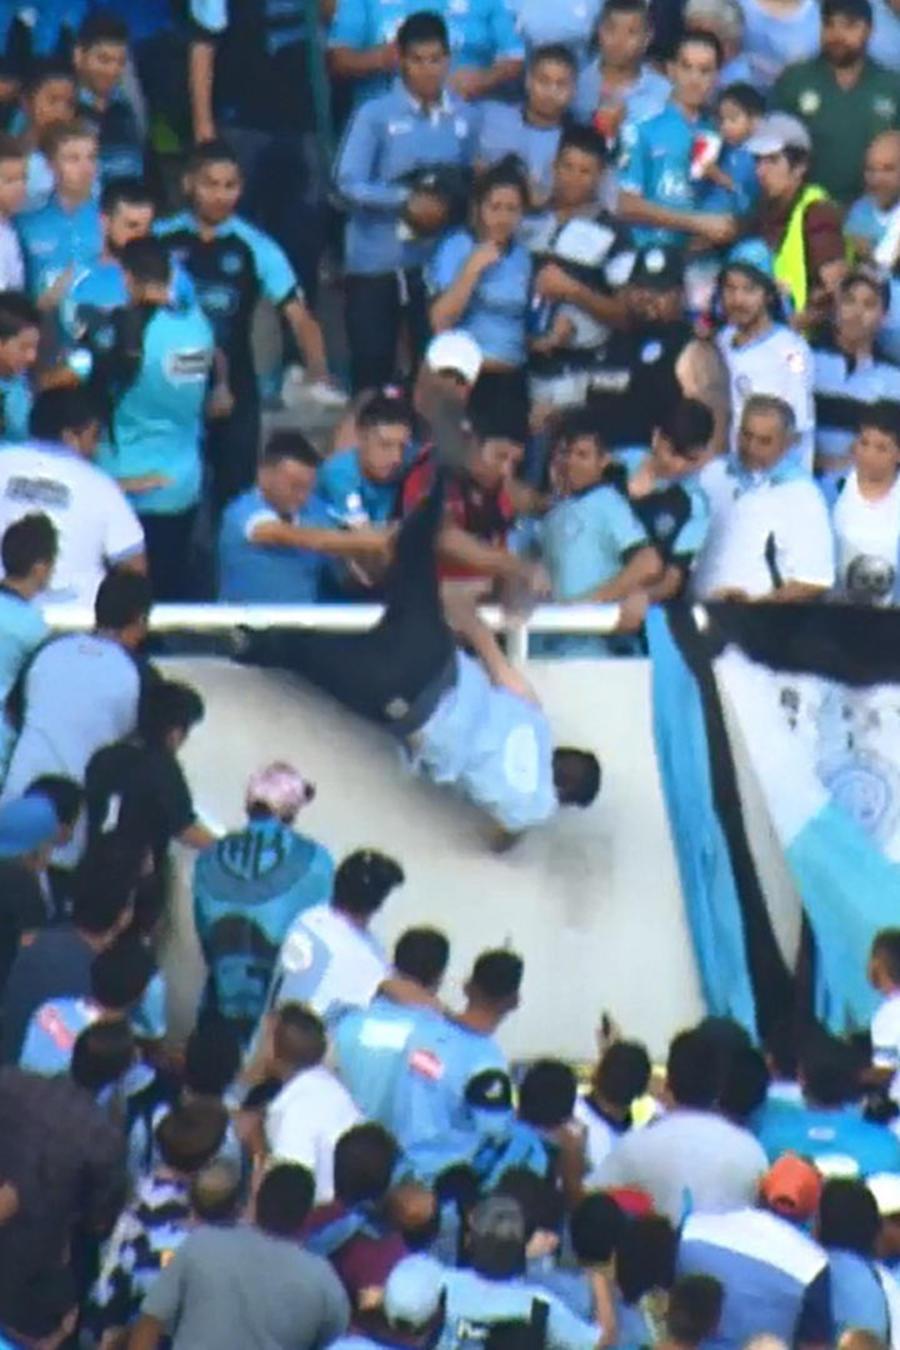 violencia partido en cordoba argentina